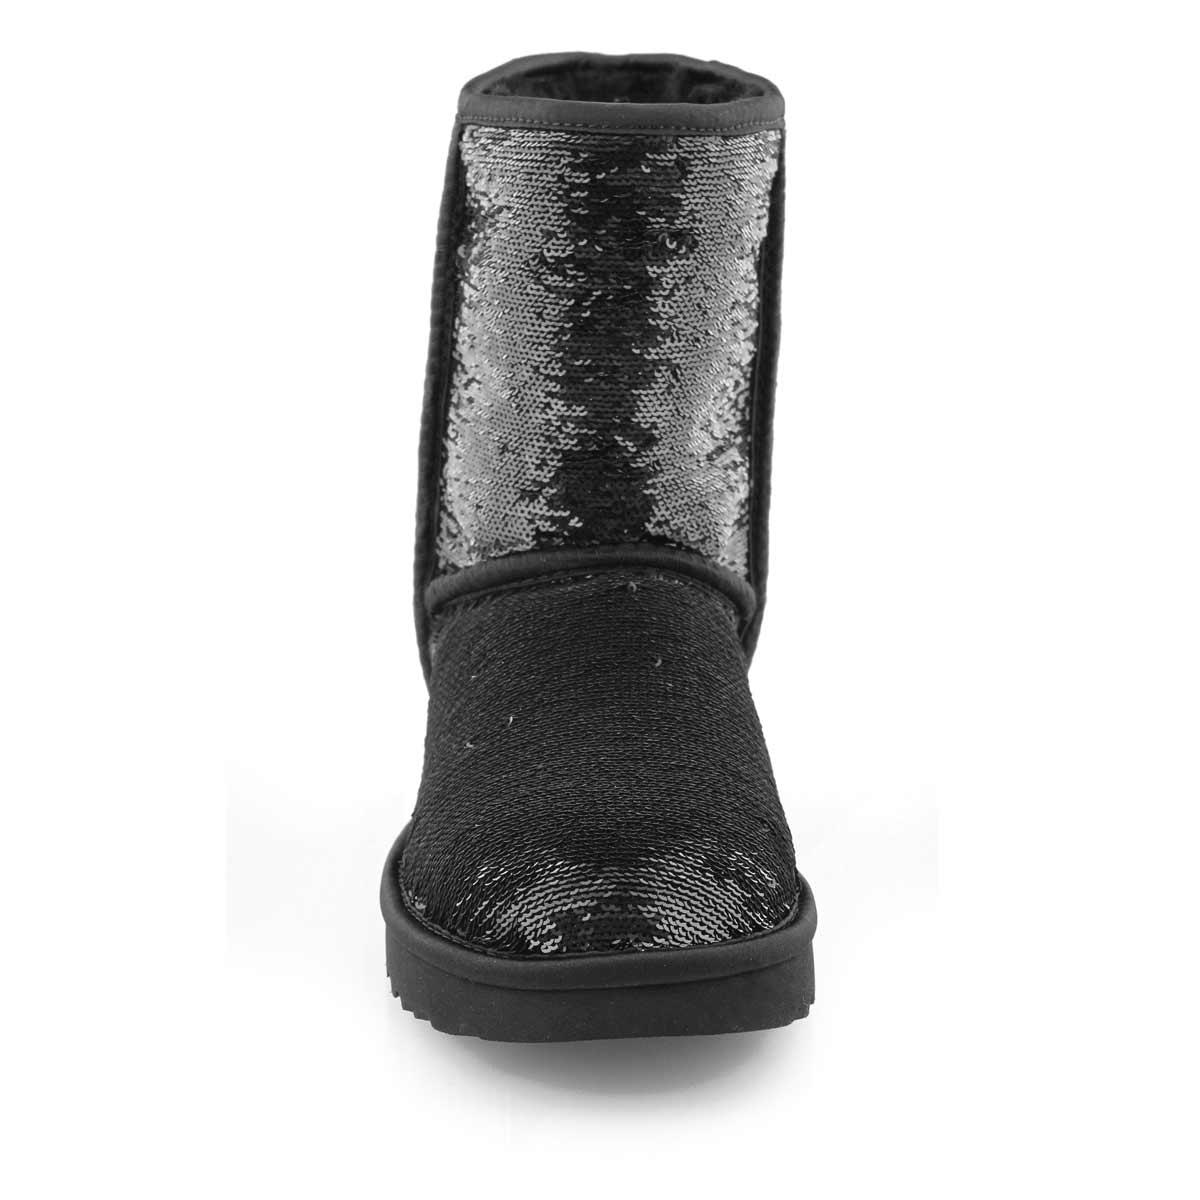 Lds Classic Short Cosmos Sequin blk boot